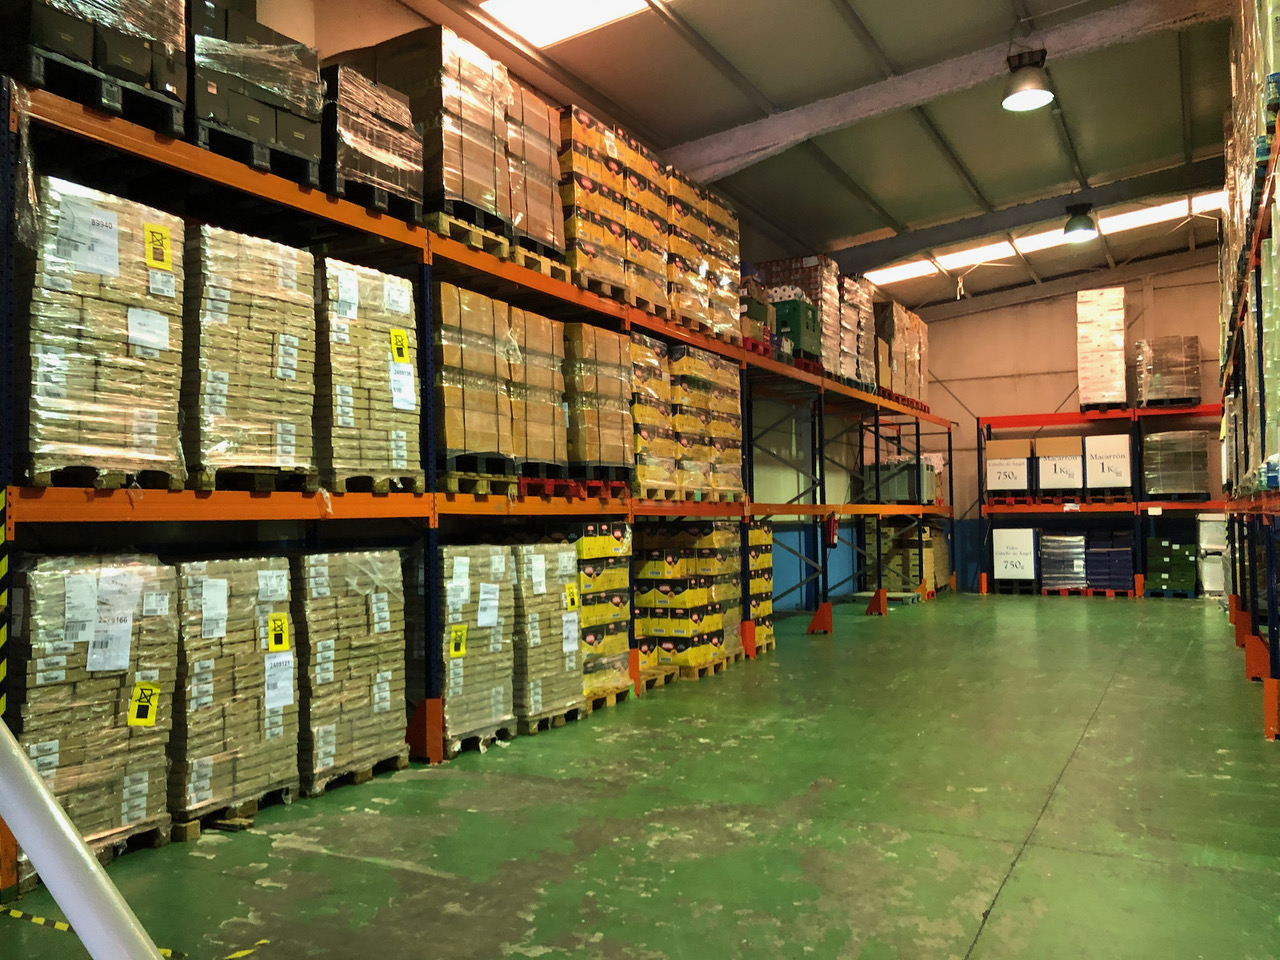 Noll Sotogrande Real Estate supports Banco de Alimentos Charity